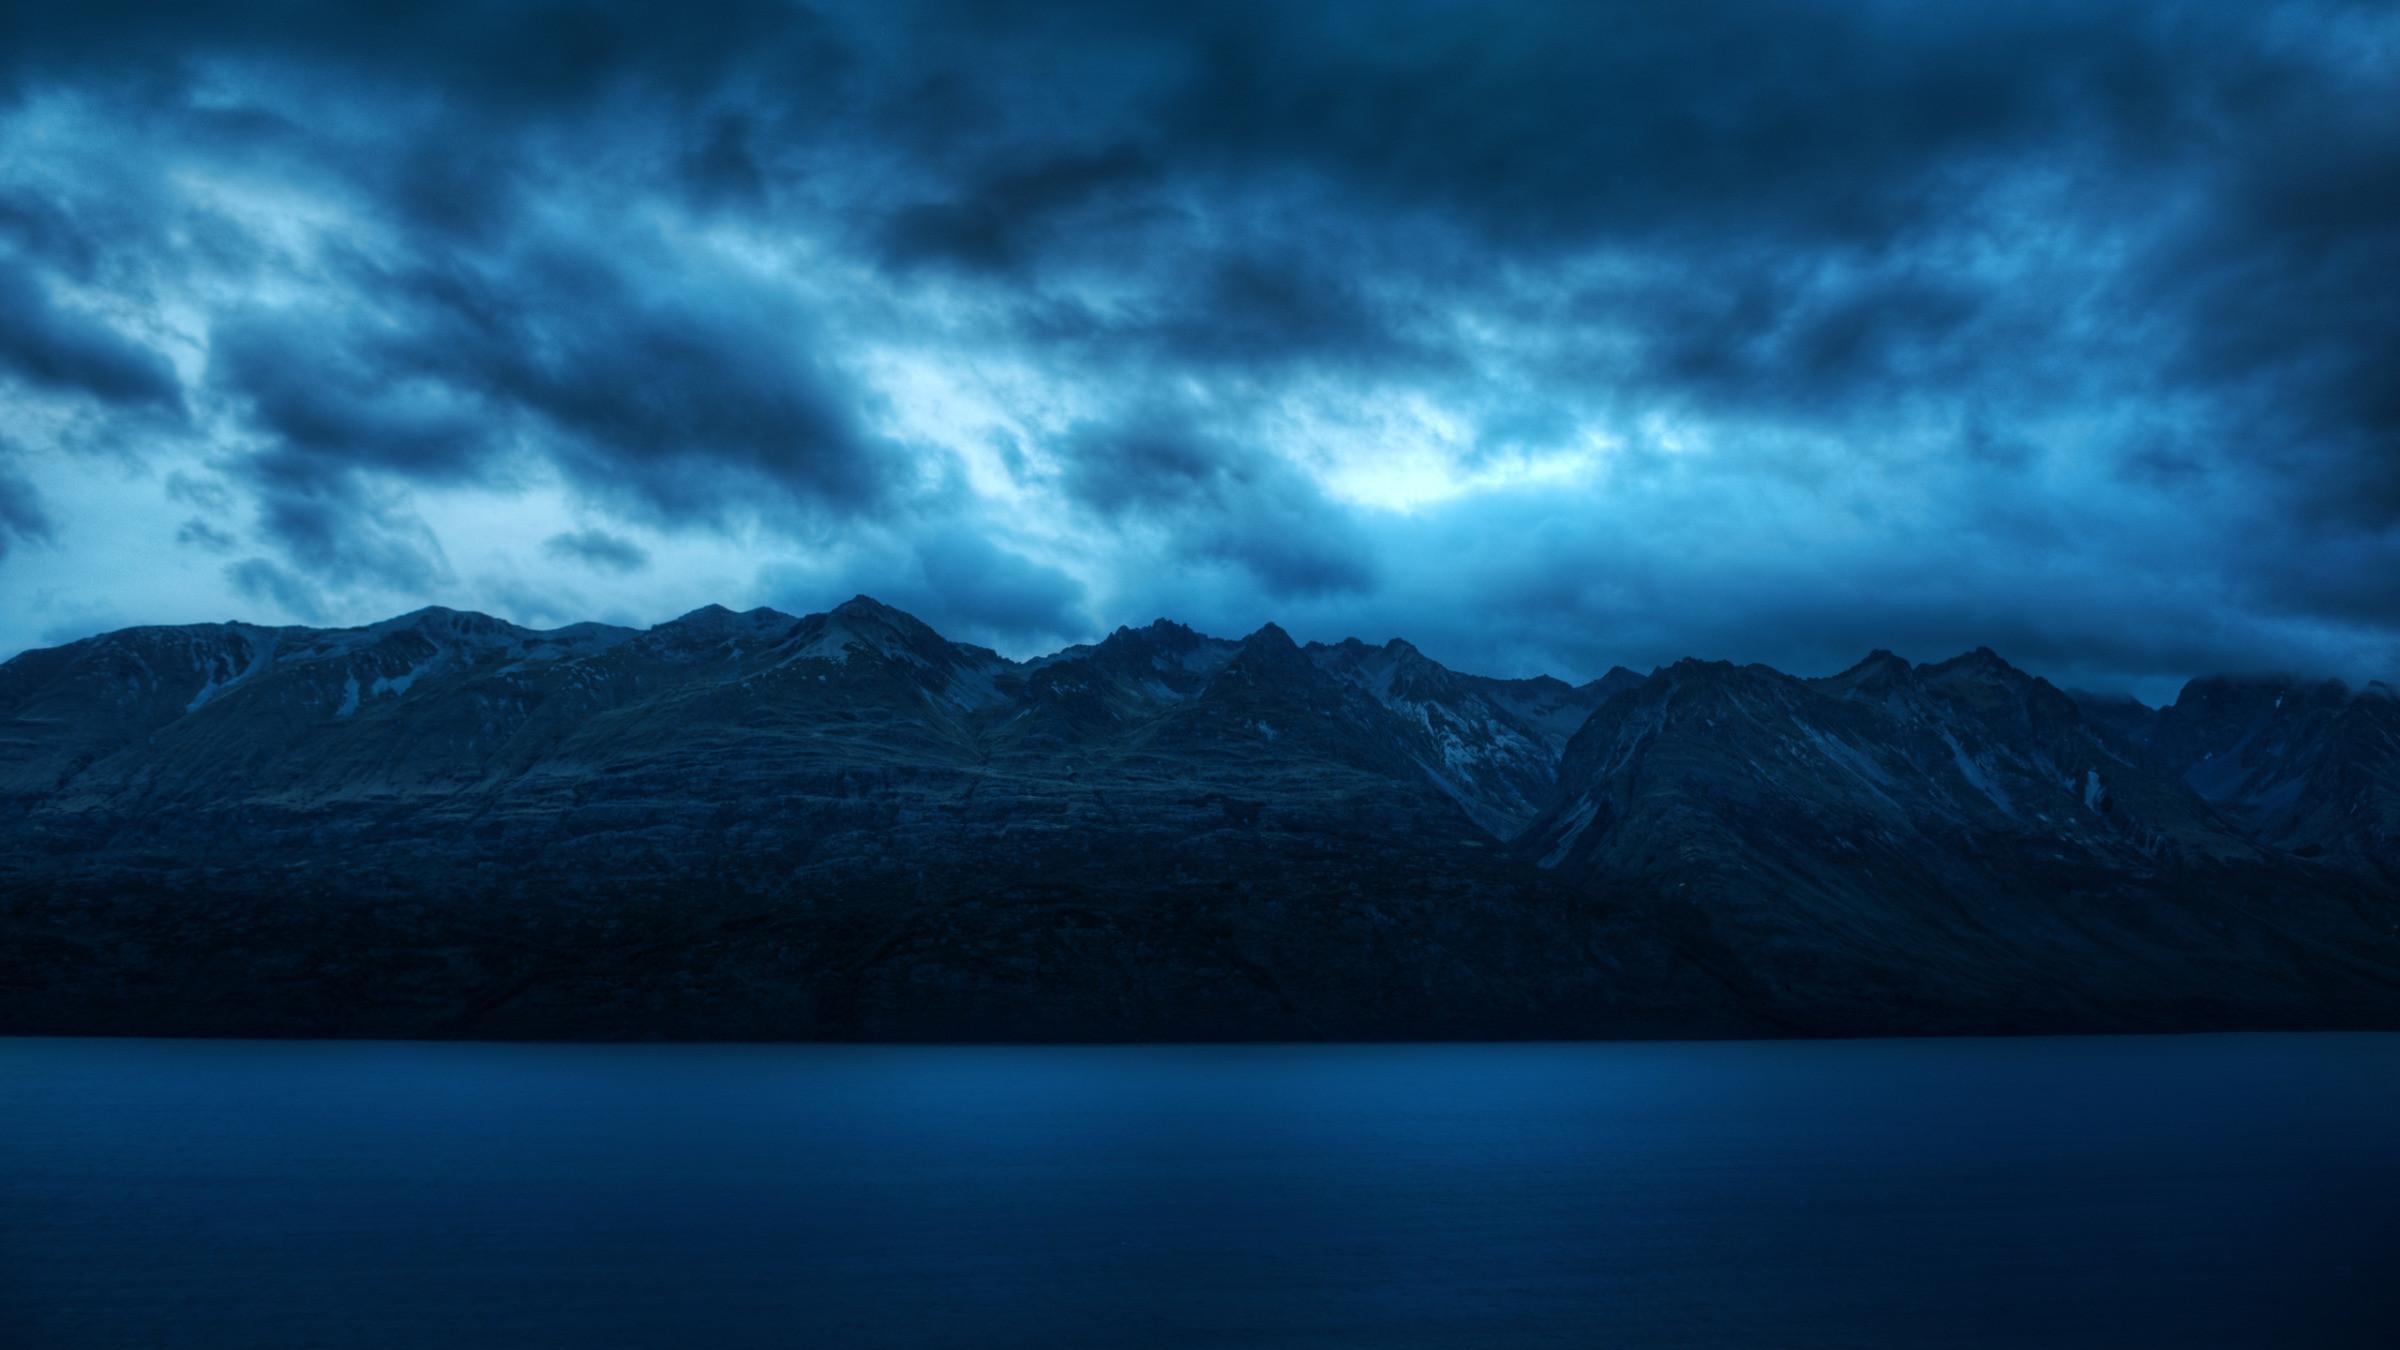 Mountain Storm wallpaper